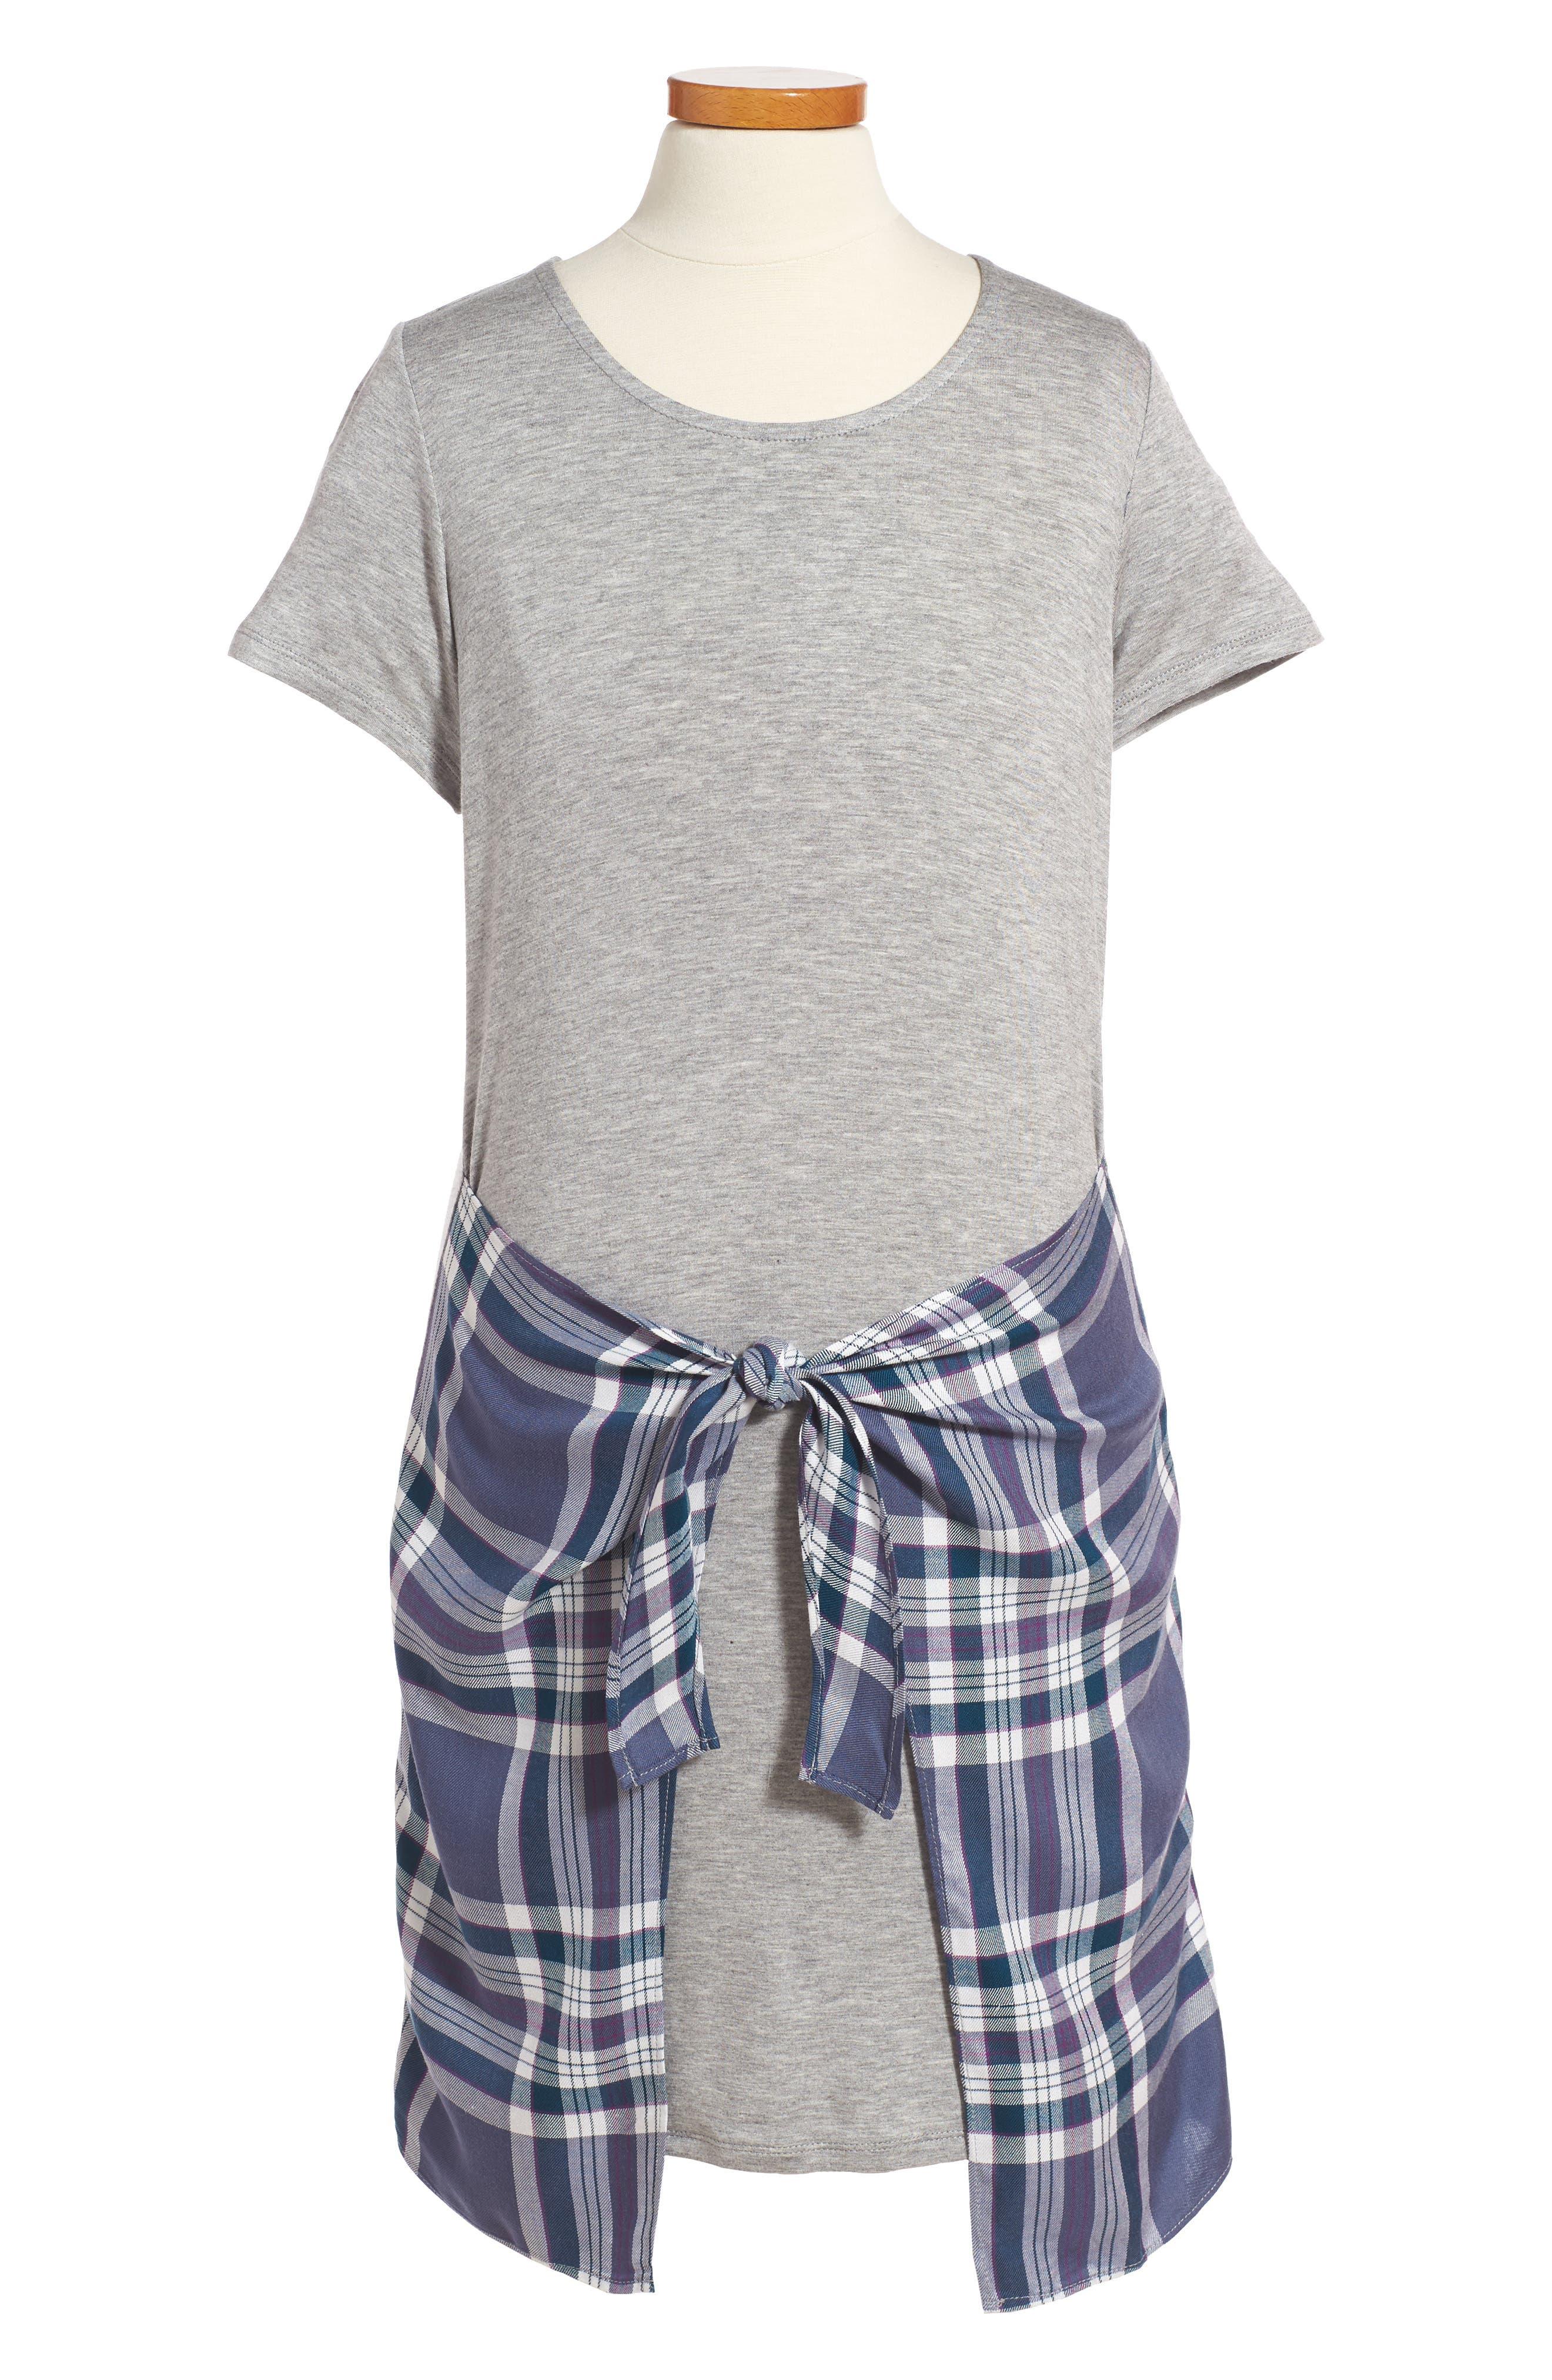 Alternate Image 1 Selected - Love, Fire Faux Wrap T-Shirt Dress (Big Girls)